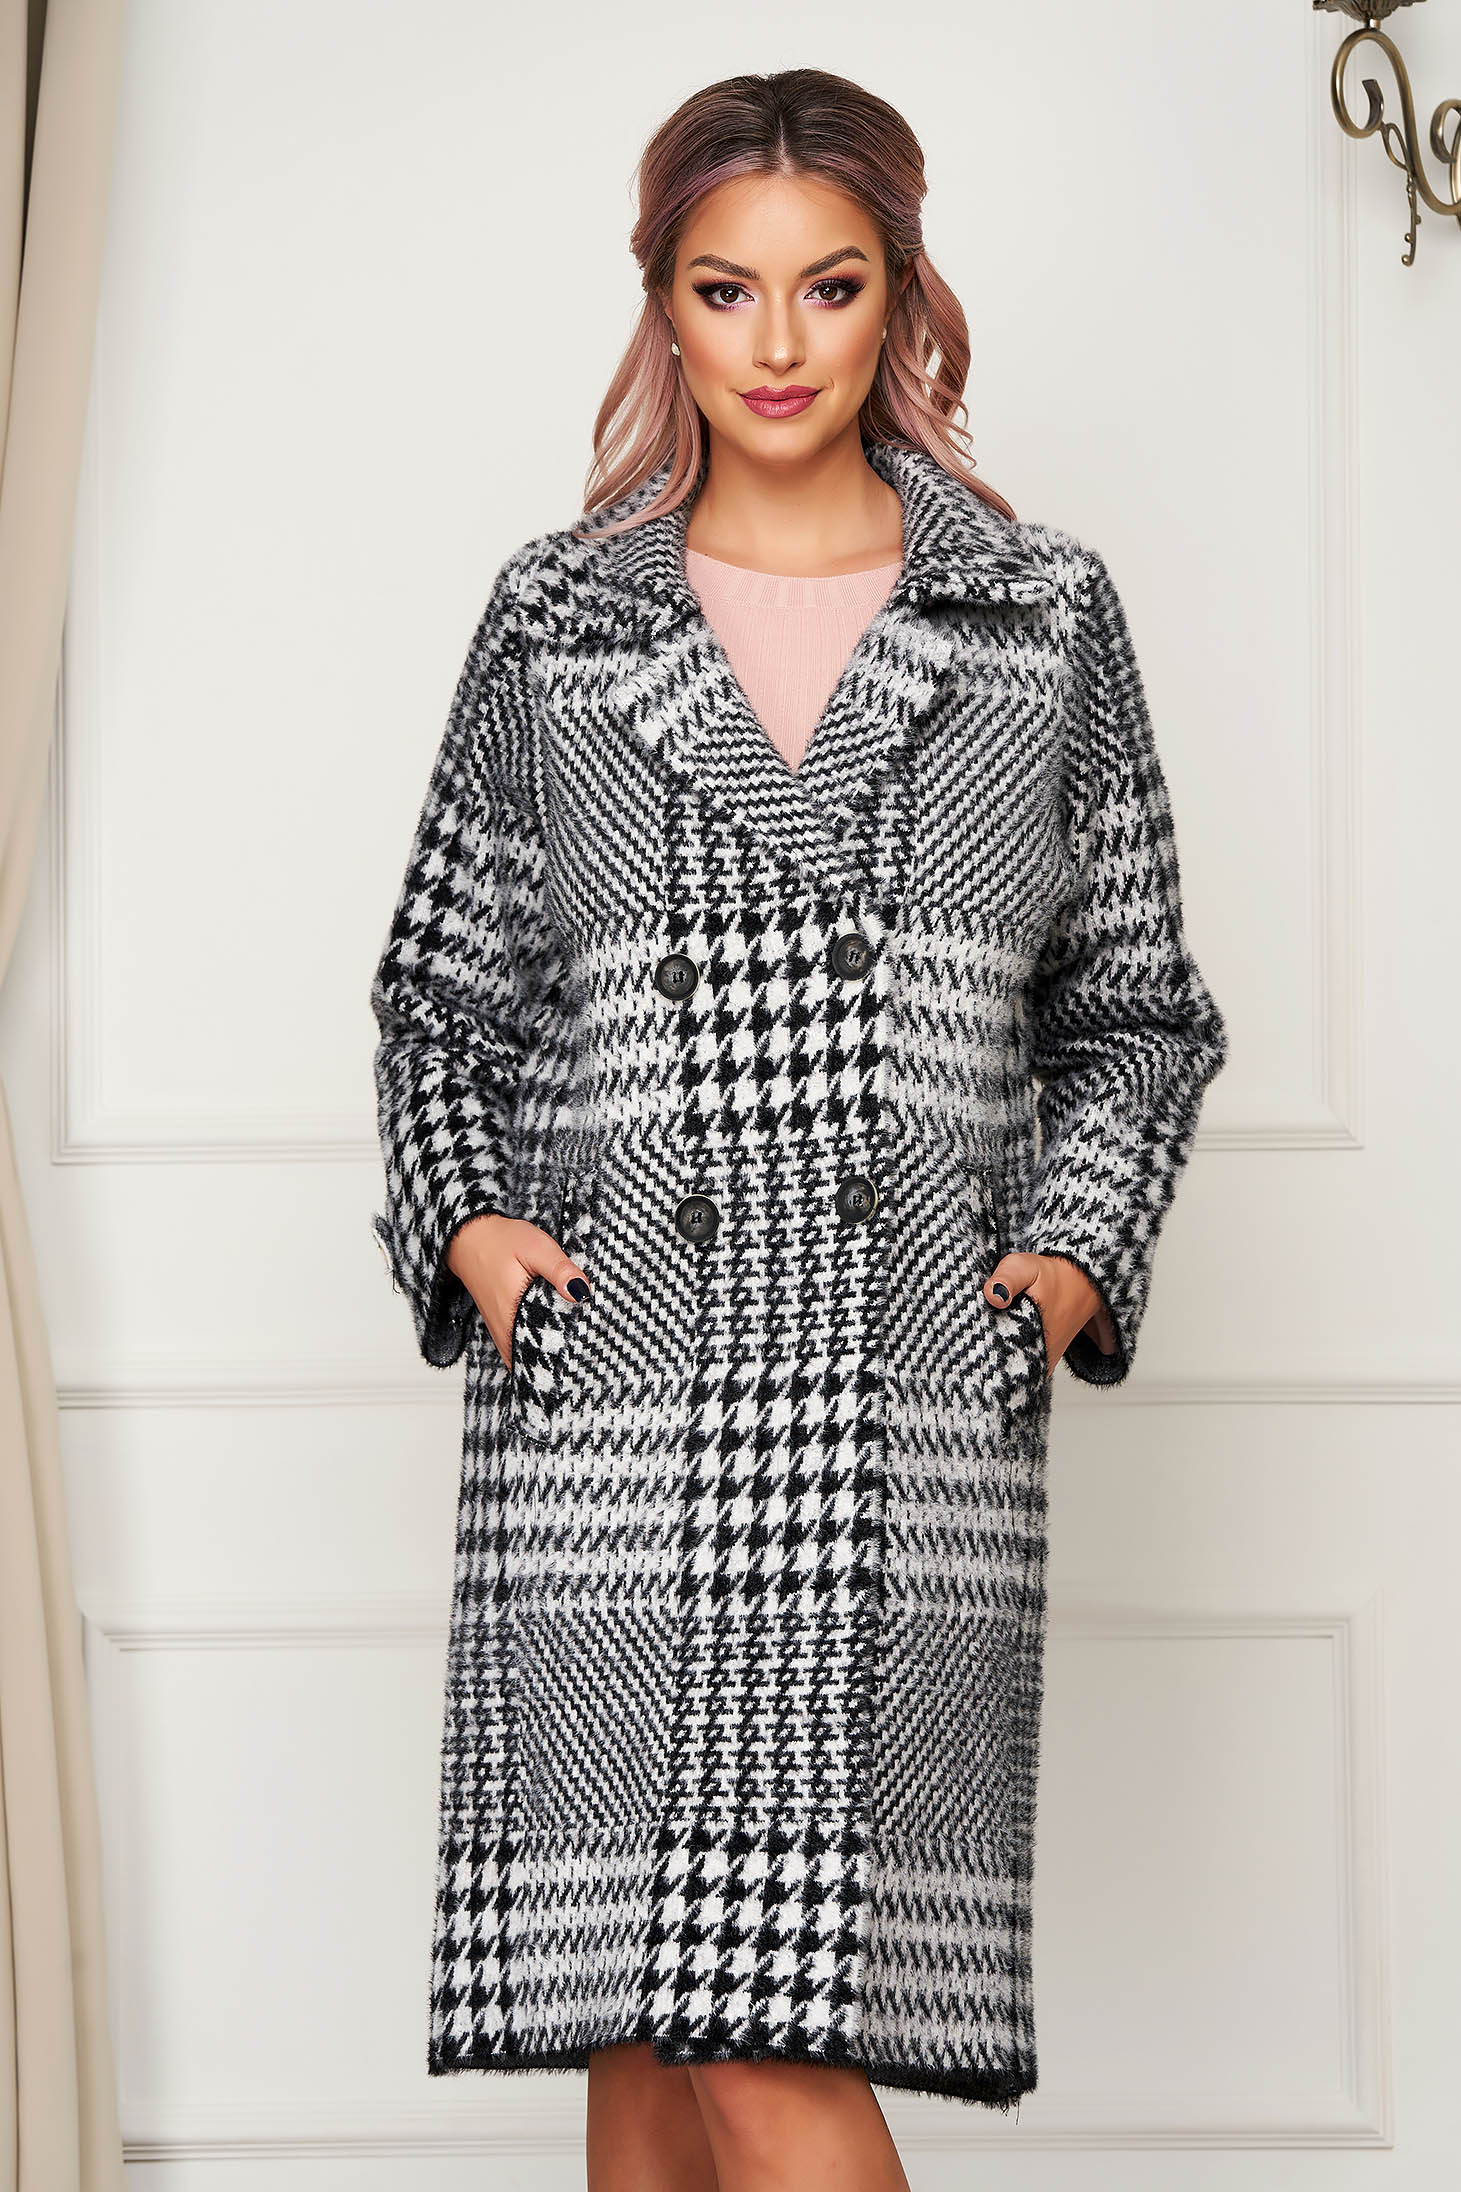 Palton SunShine elegant din lana cu croi larg in carouri